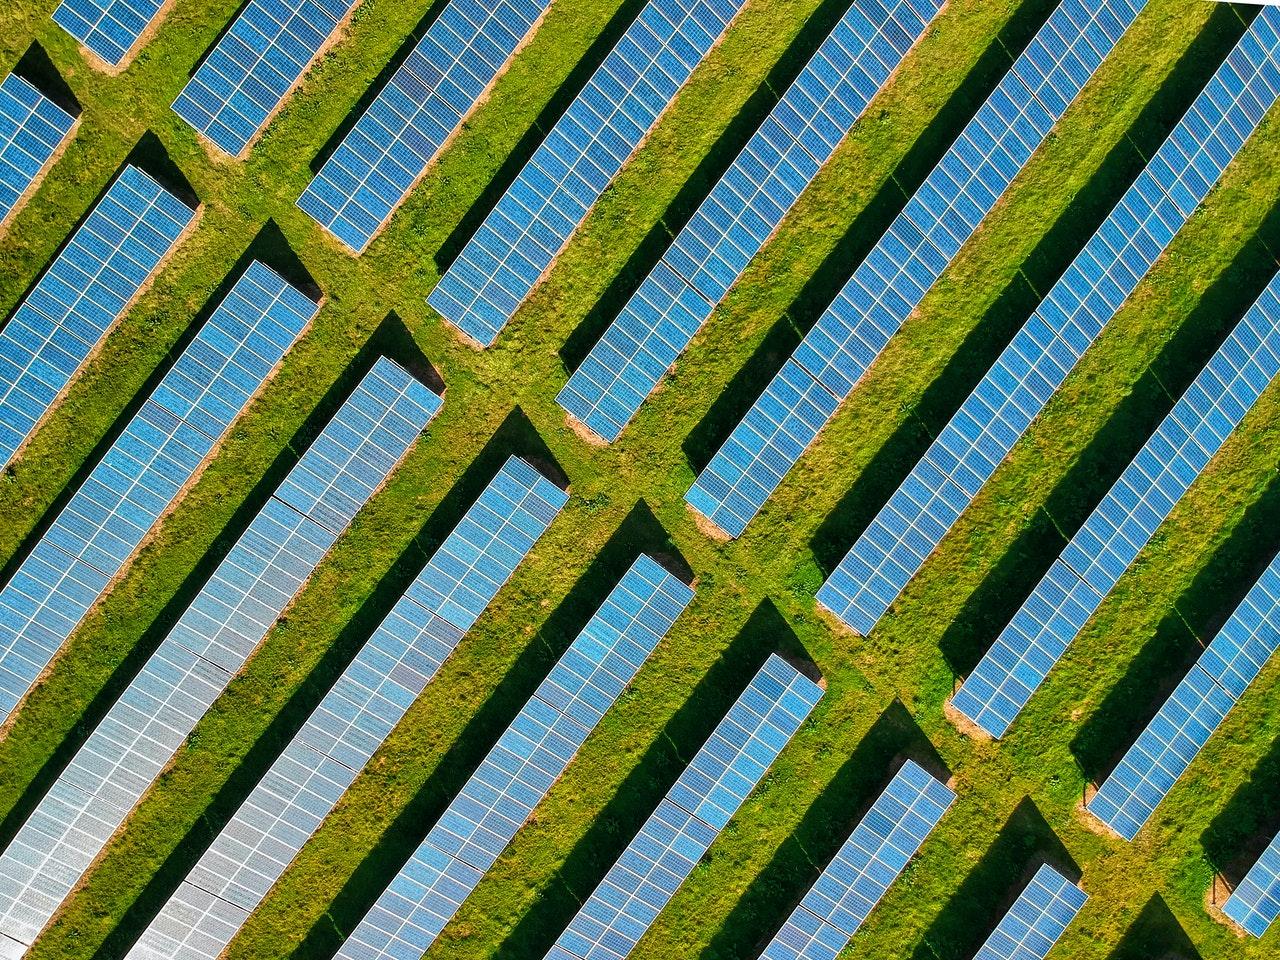 Energia verde em Portugal